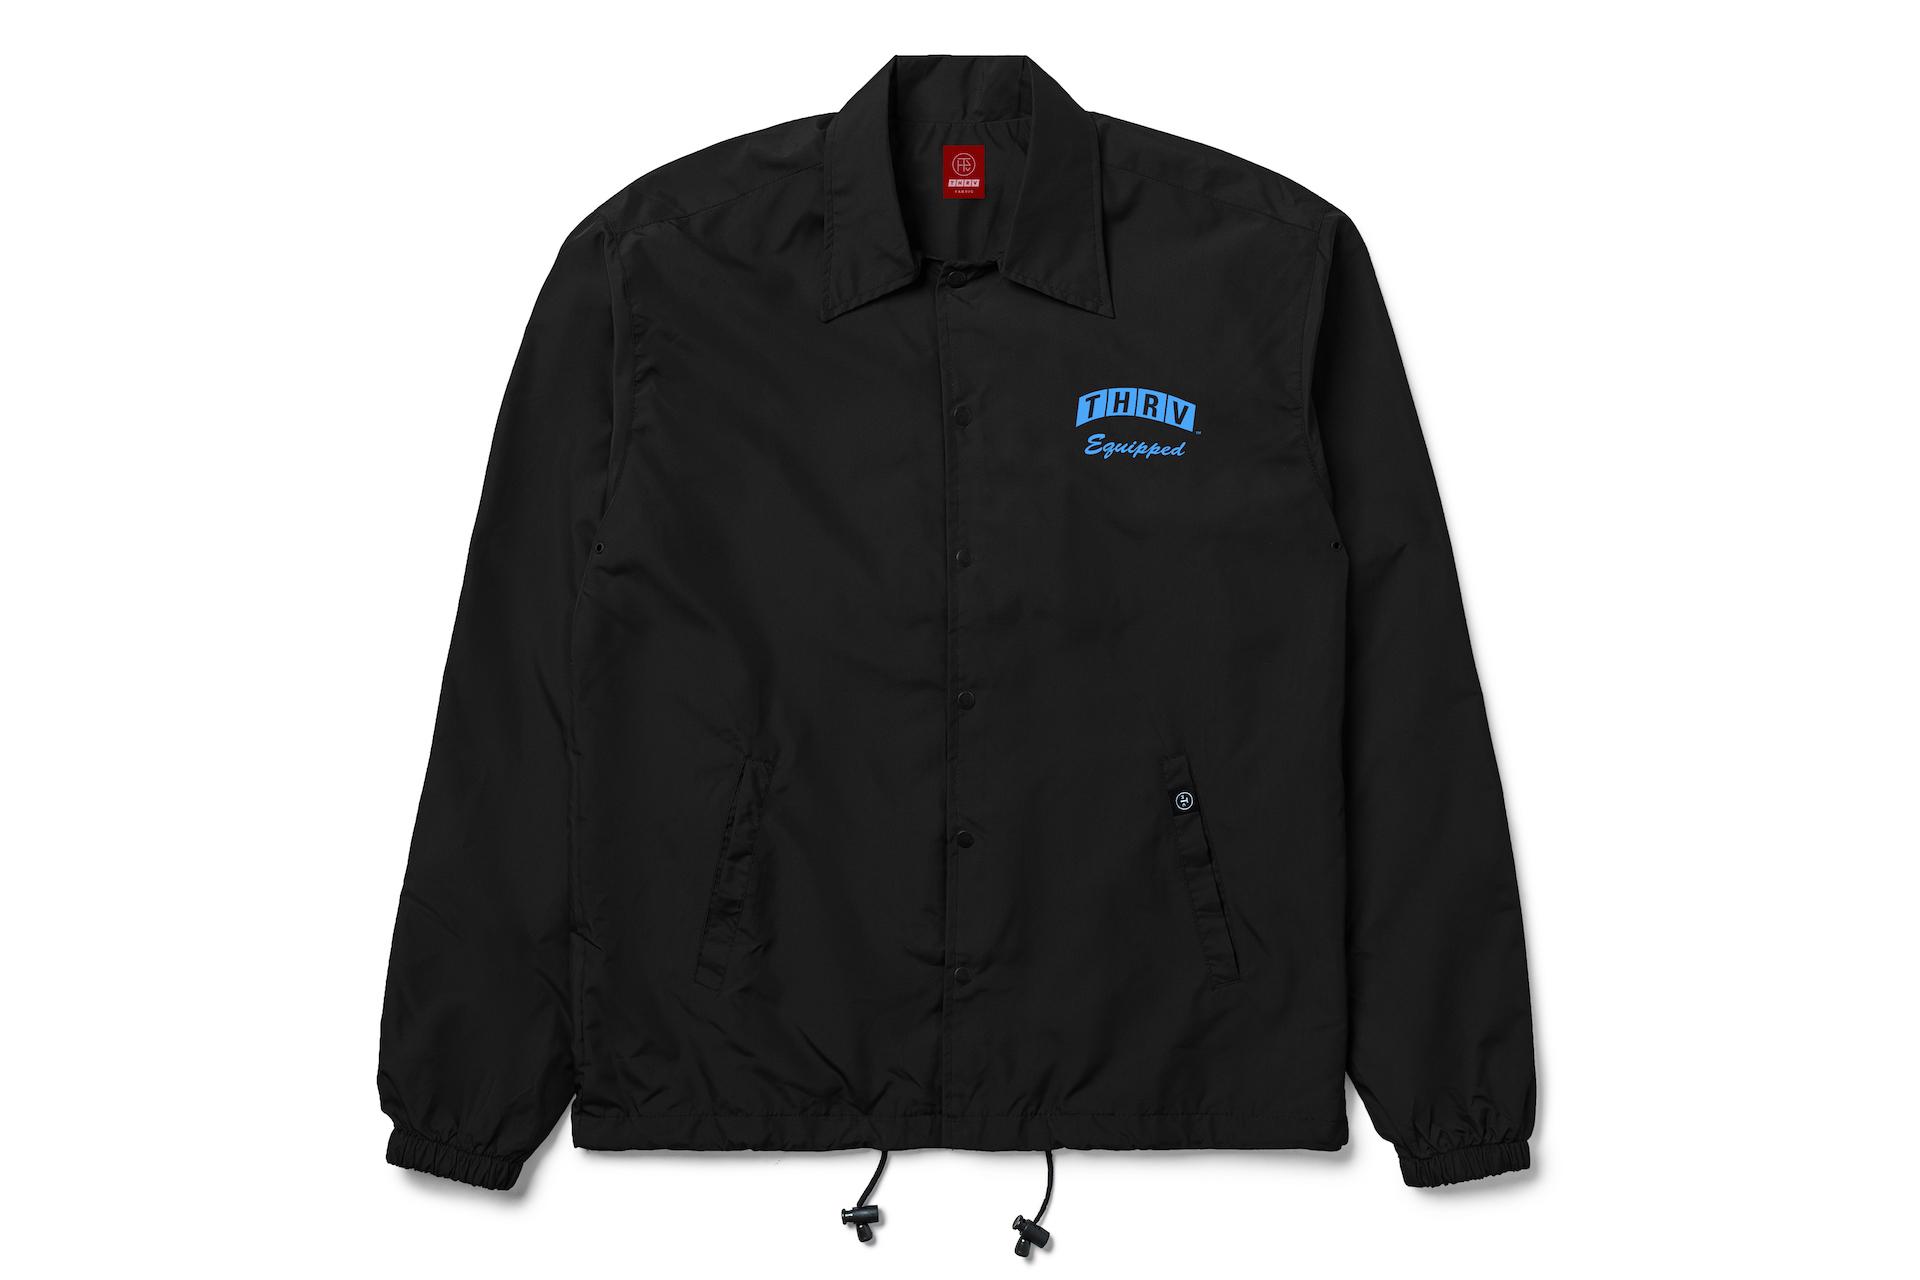 Globetrotter Black Coach Jacket